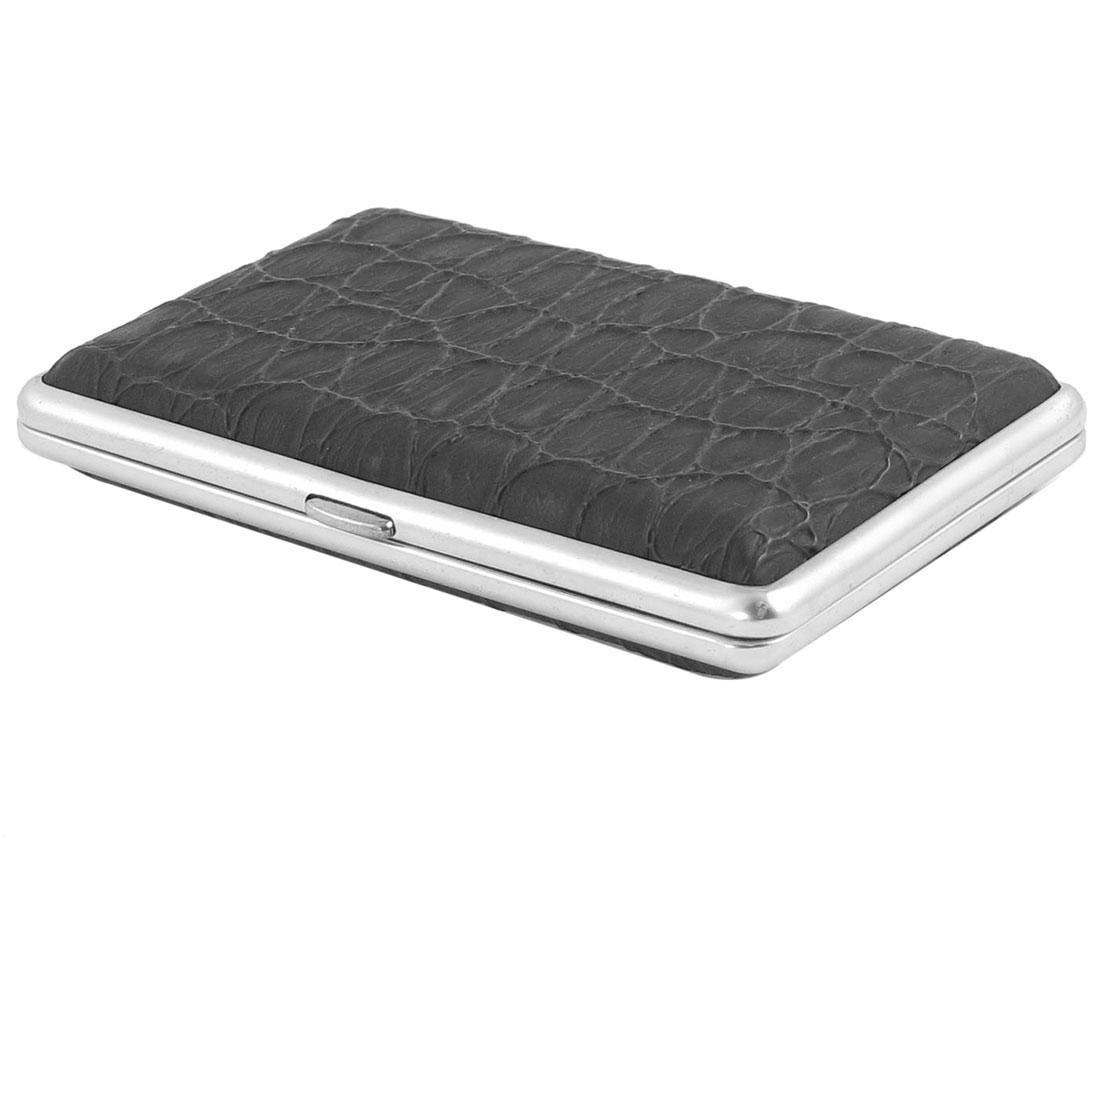 10.7cm x 6.7cm Faux Leather Coated Rectangular Metal Cigarette Case